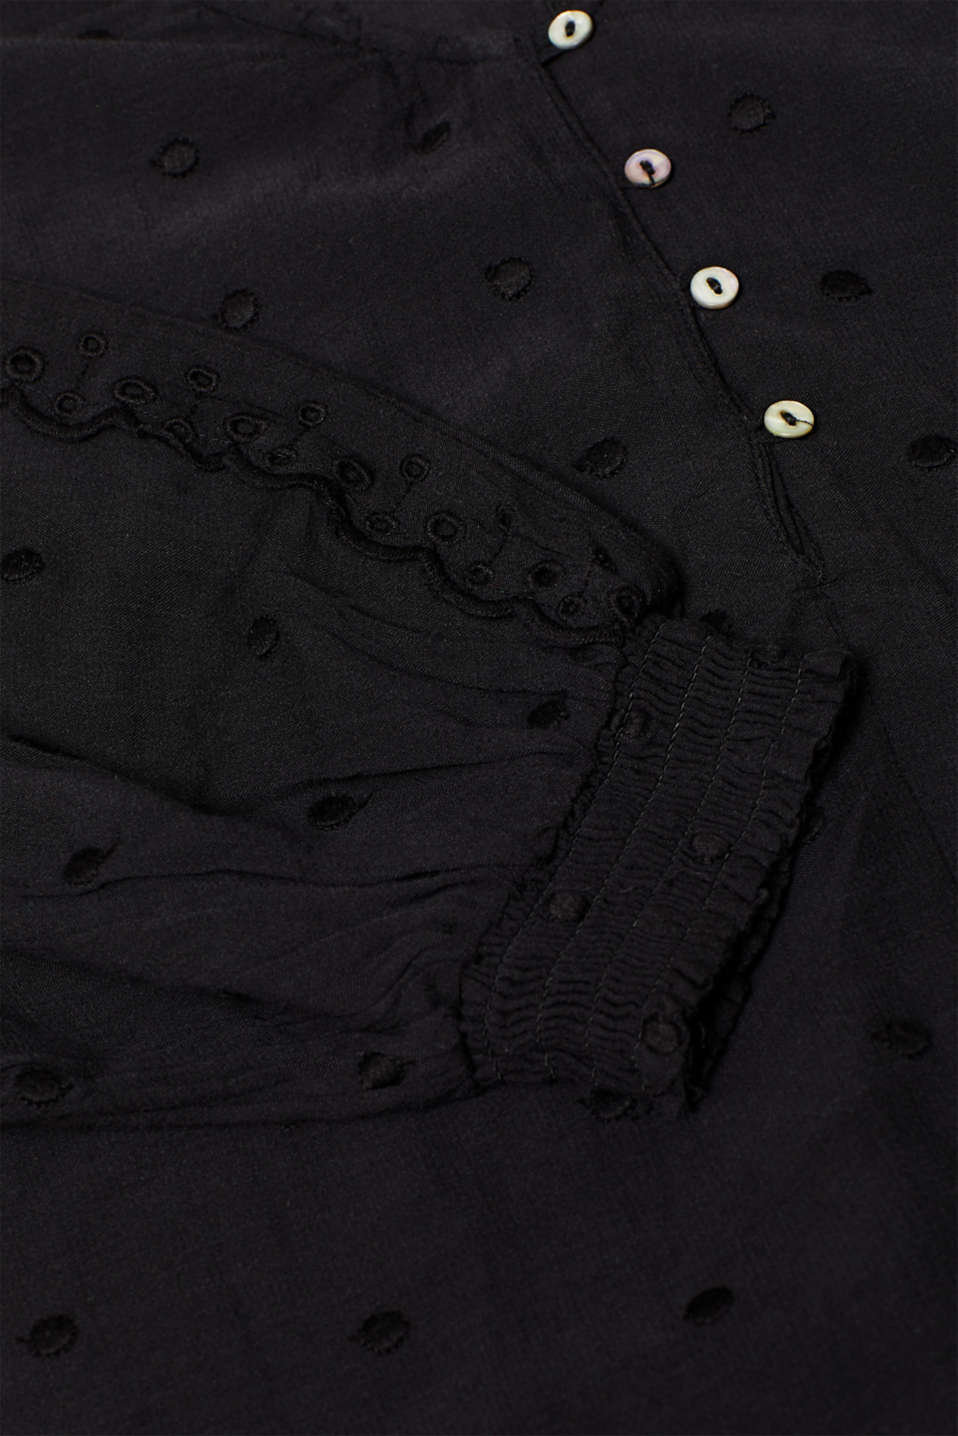 Lace-trimmed blouse, BLACK, detail image number 4